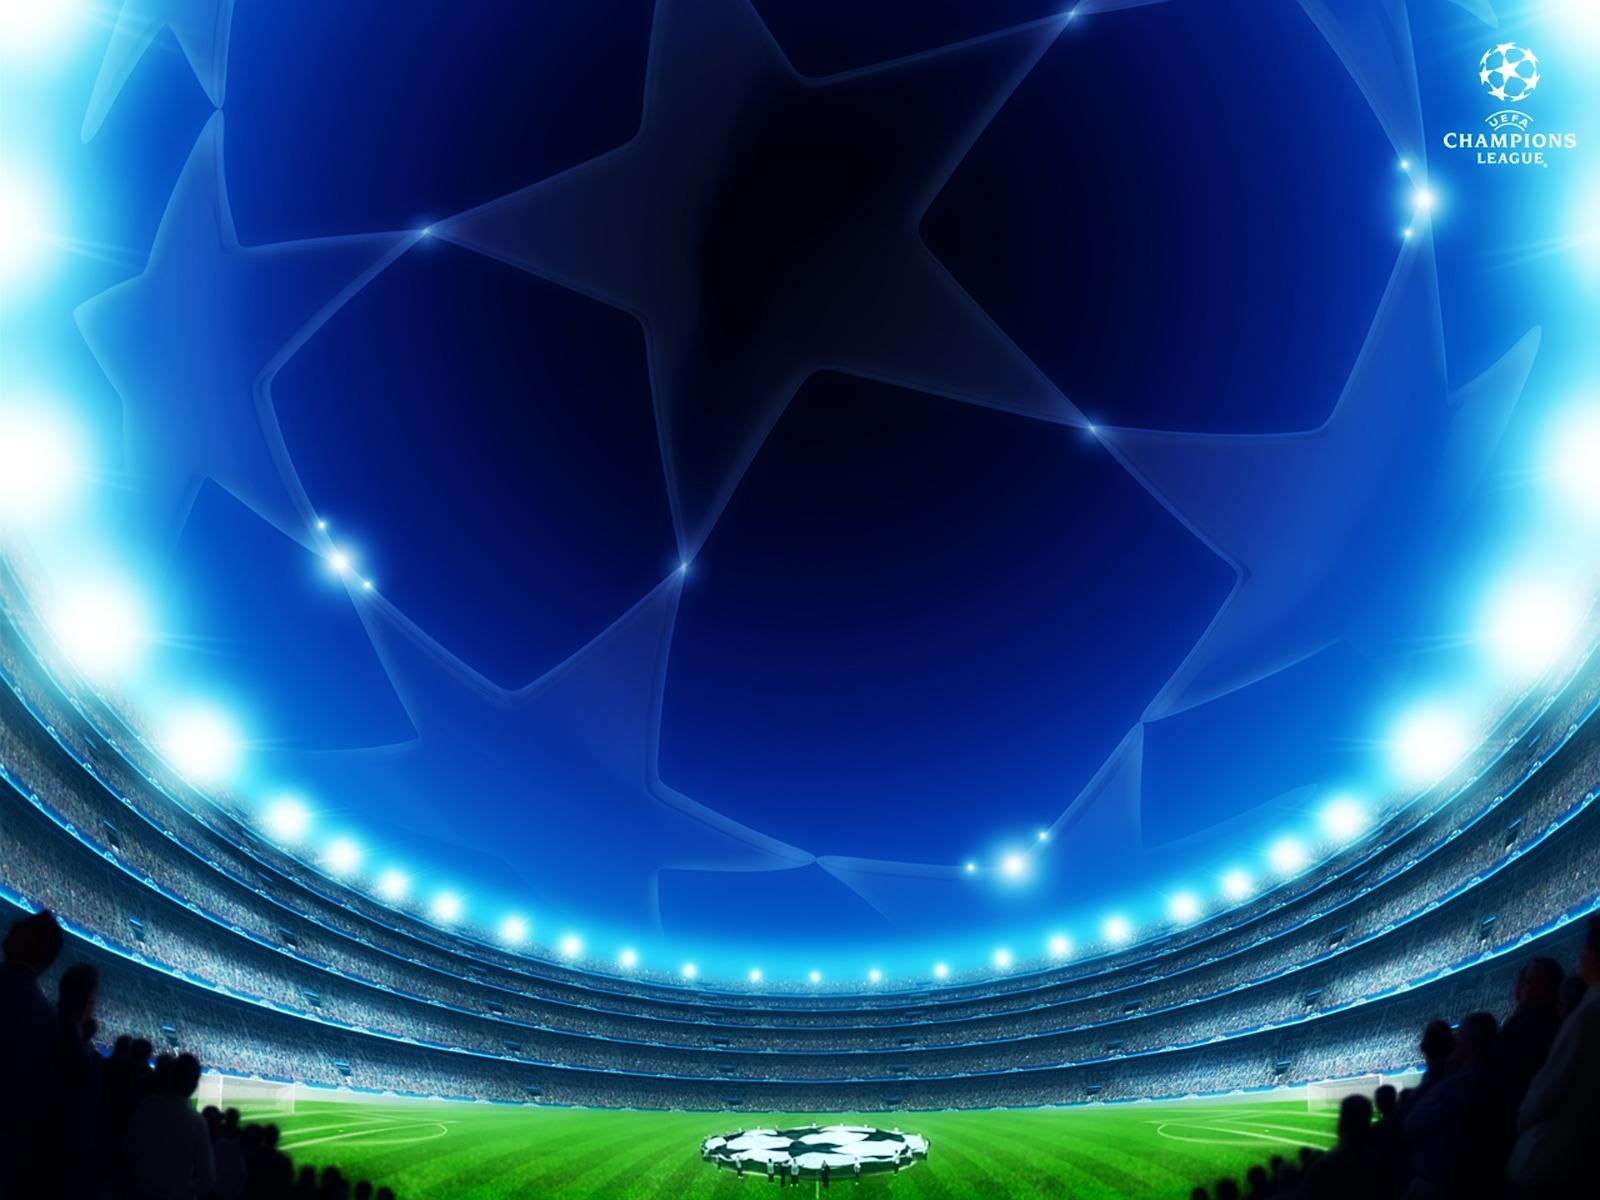 http://1.bp.blogspot.com/-WNExvbsc9gM/TeJR6fyRk3I/AAAAAAAAAA8/5v8G1TLkGeg/s1600/3D+Football+Wallpapers-3.jpg